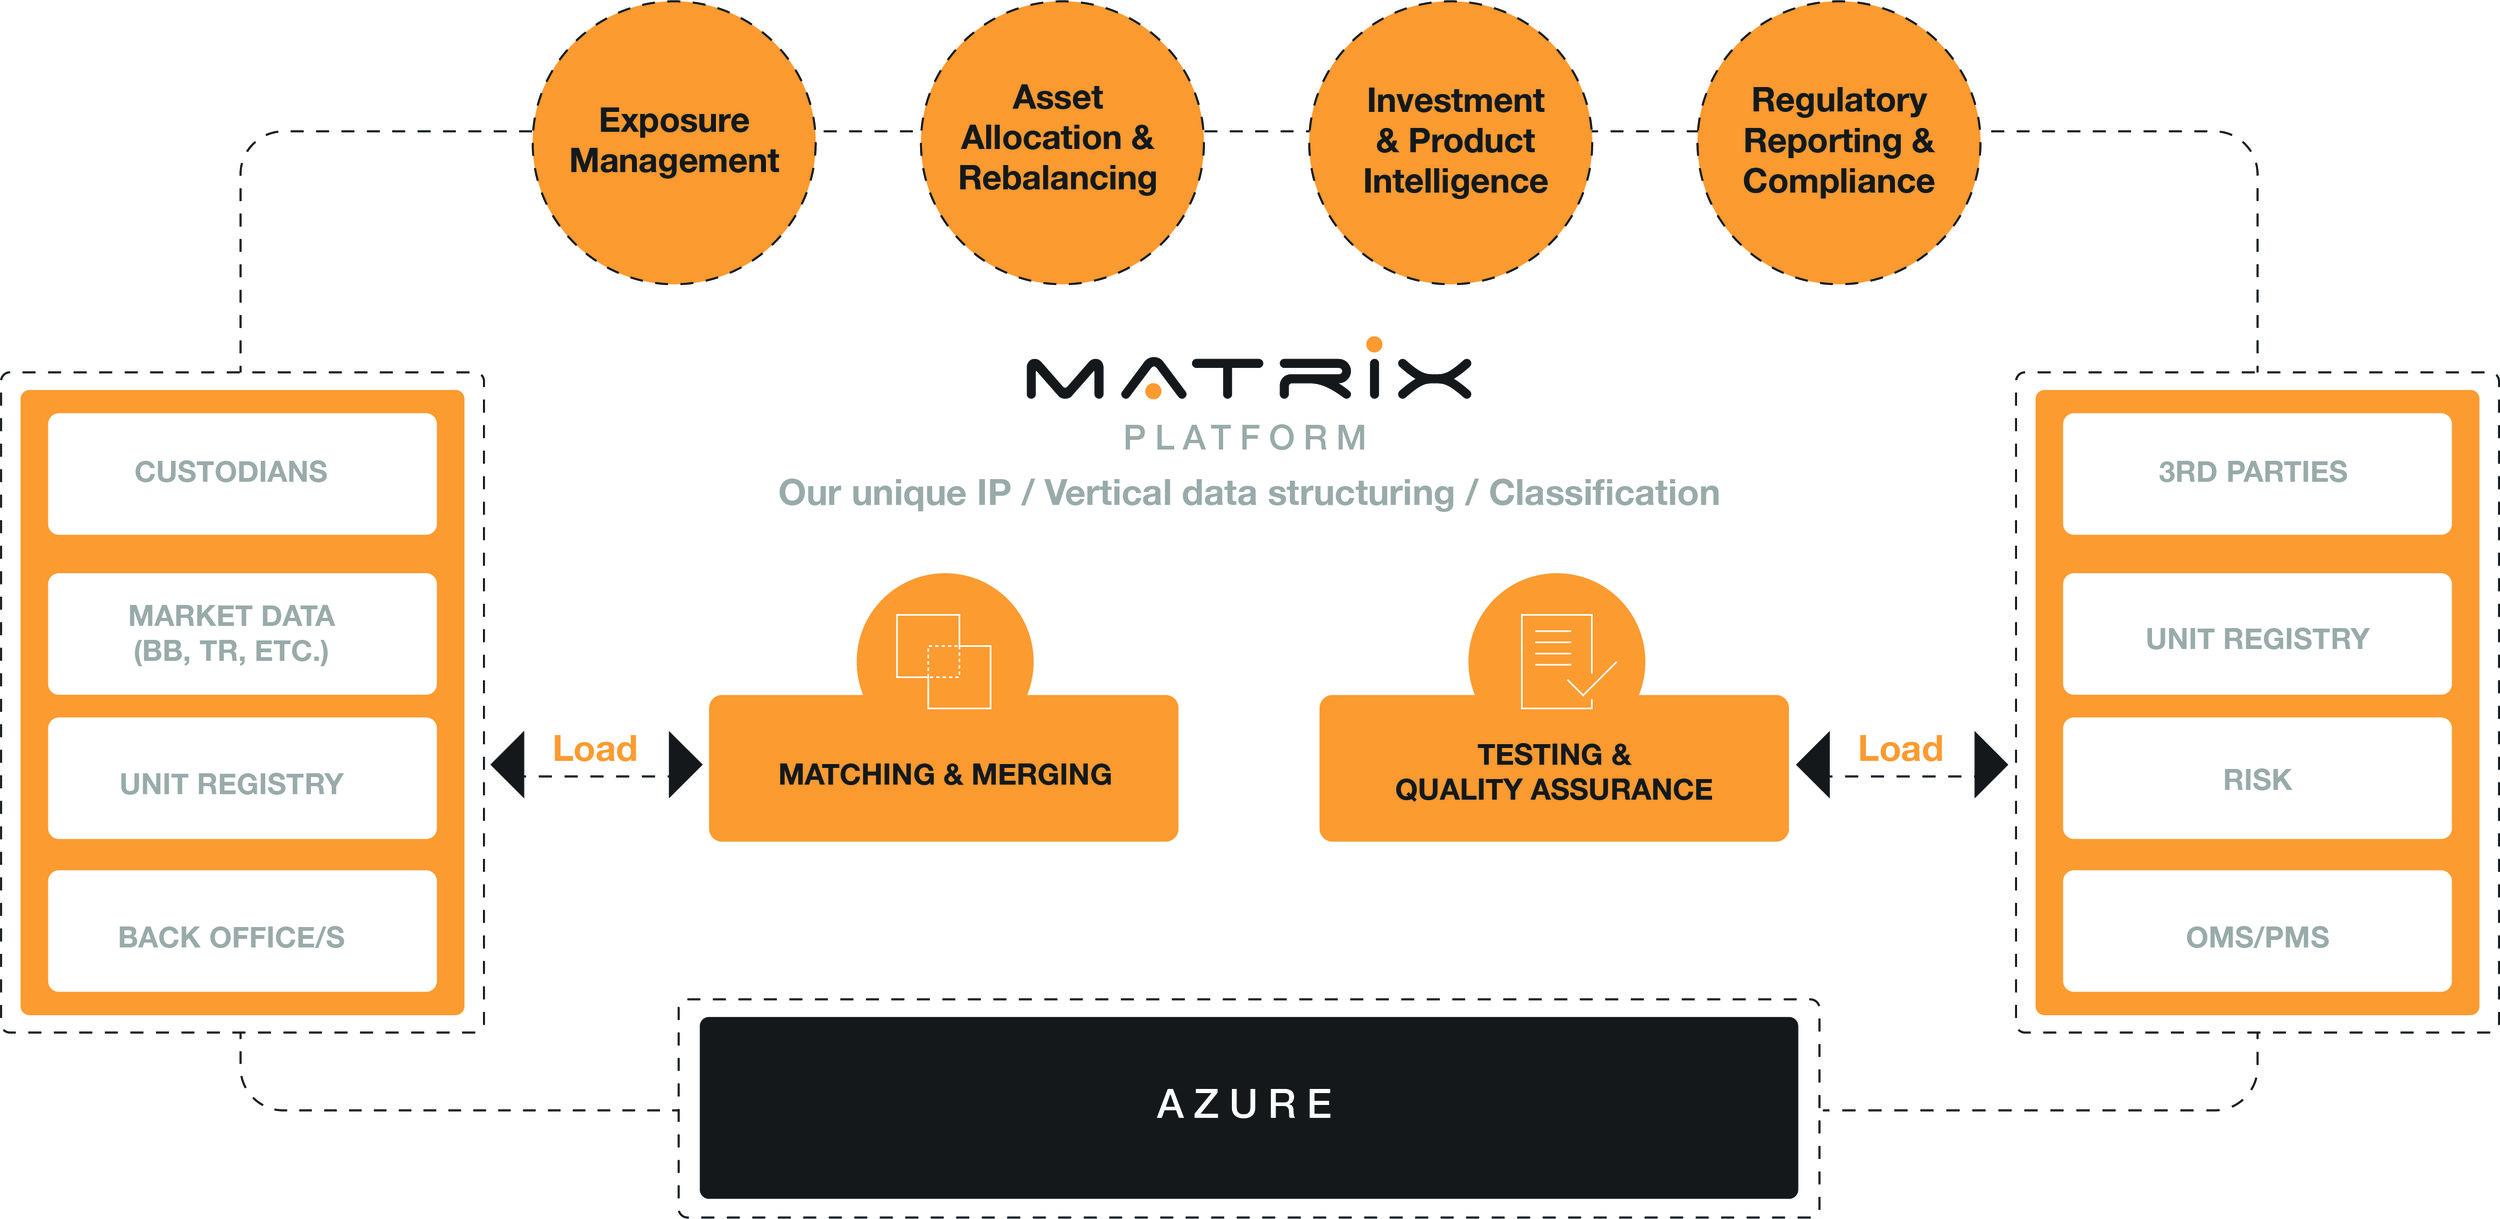 2034_19_May Matrix infographics - no title.jpg